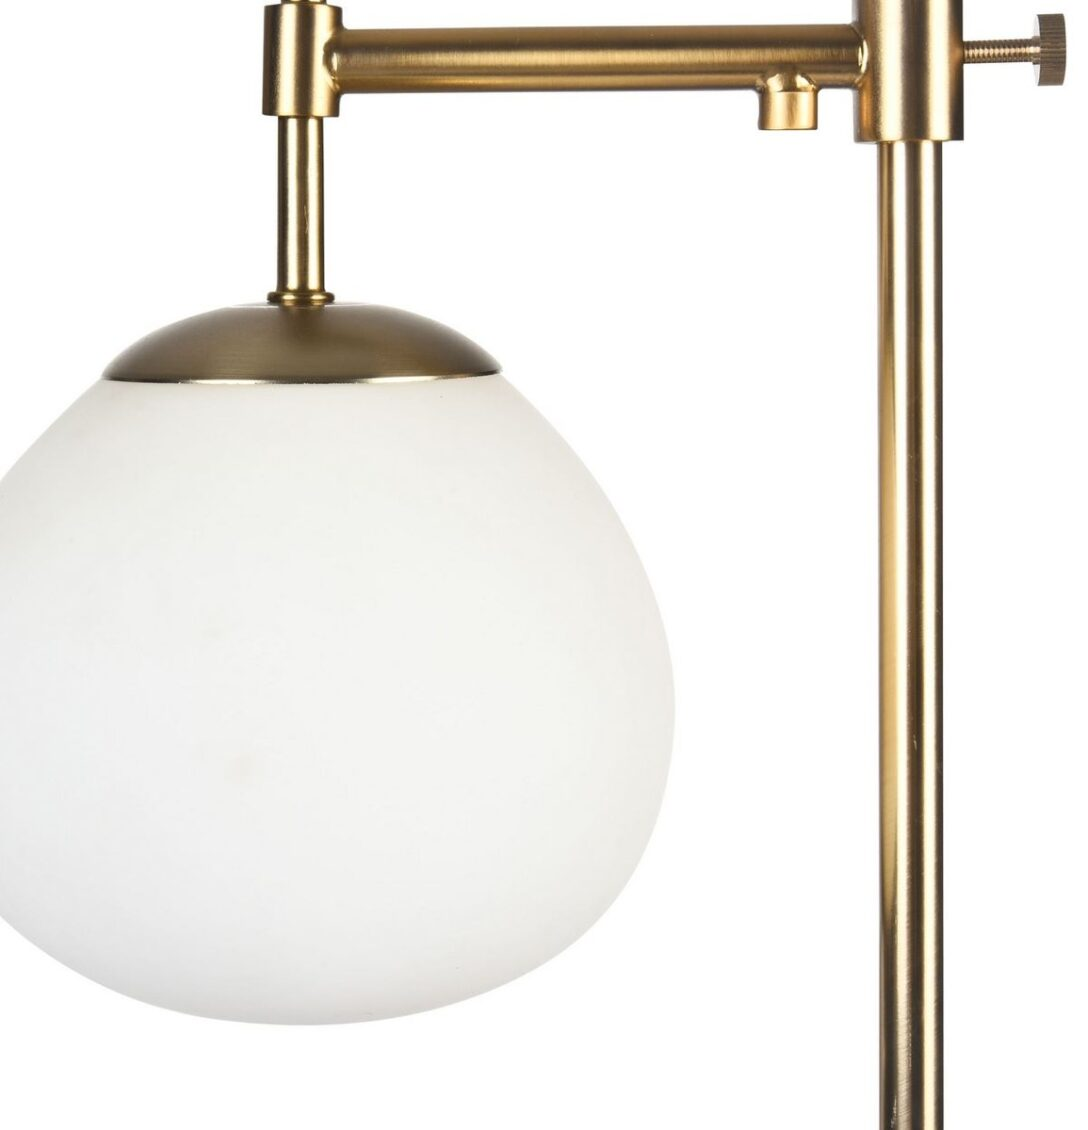 Large Size of Amazon Wohnzimmer Lampe Ikea Tischlampe Ebay Led Designer Tischlampen Modern Holz Dimmbar Casa Padrino Tischleuchte Gold 17 H 65 Cm Gardinen Für Moderne Wohnzimmer Wohnzimmer Tischlampe